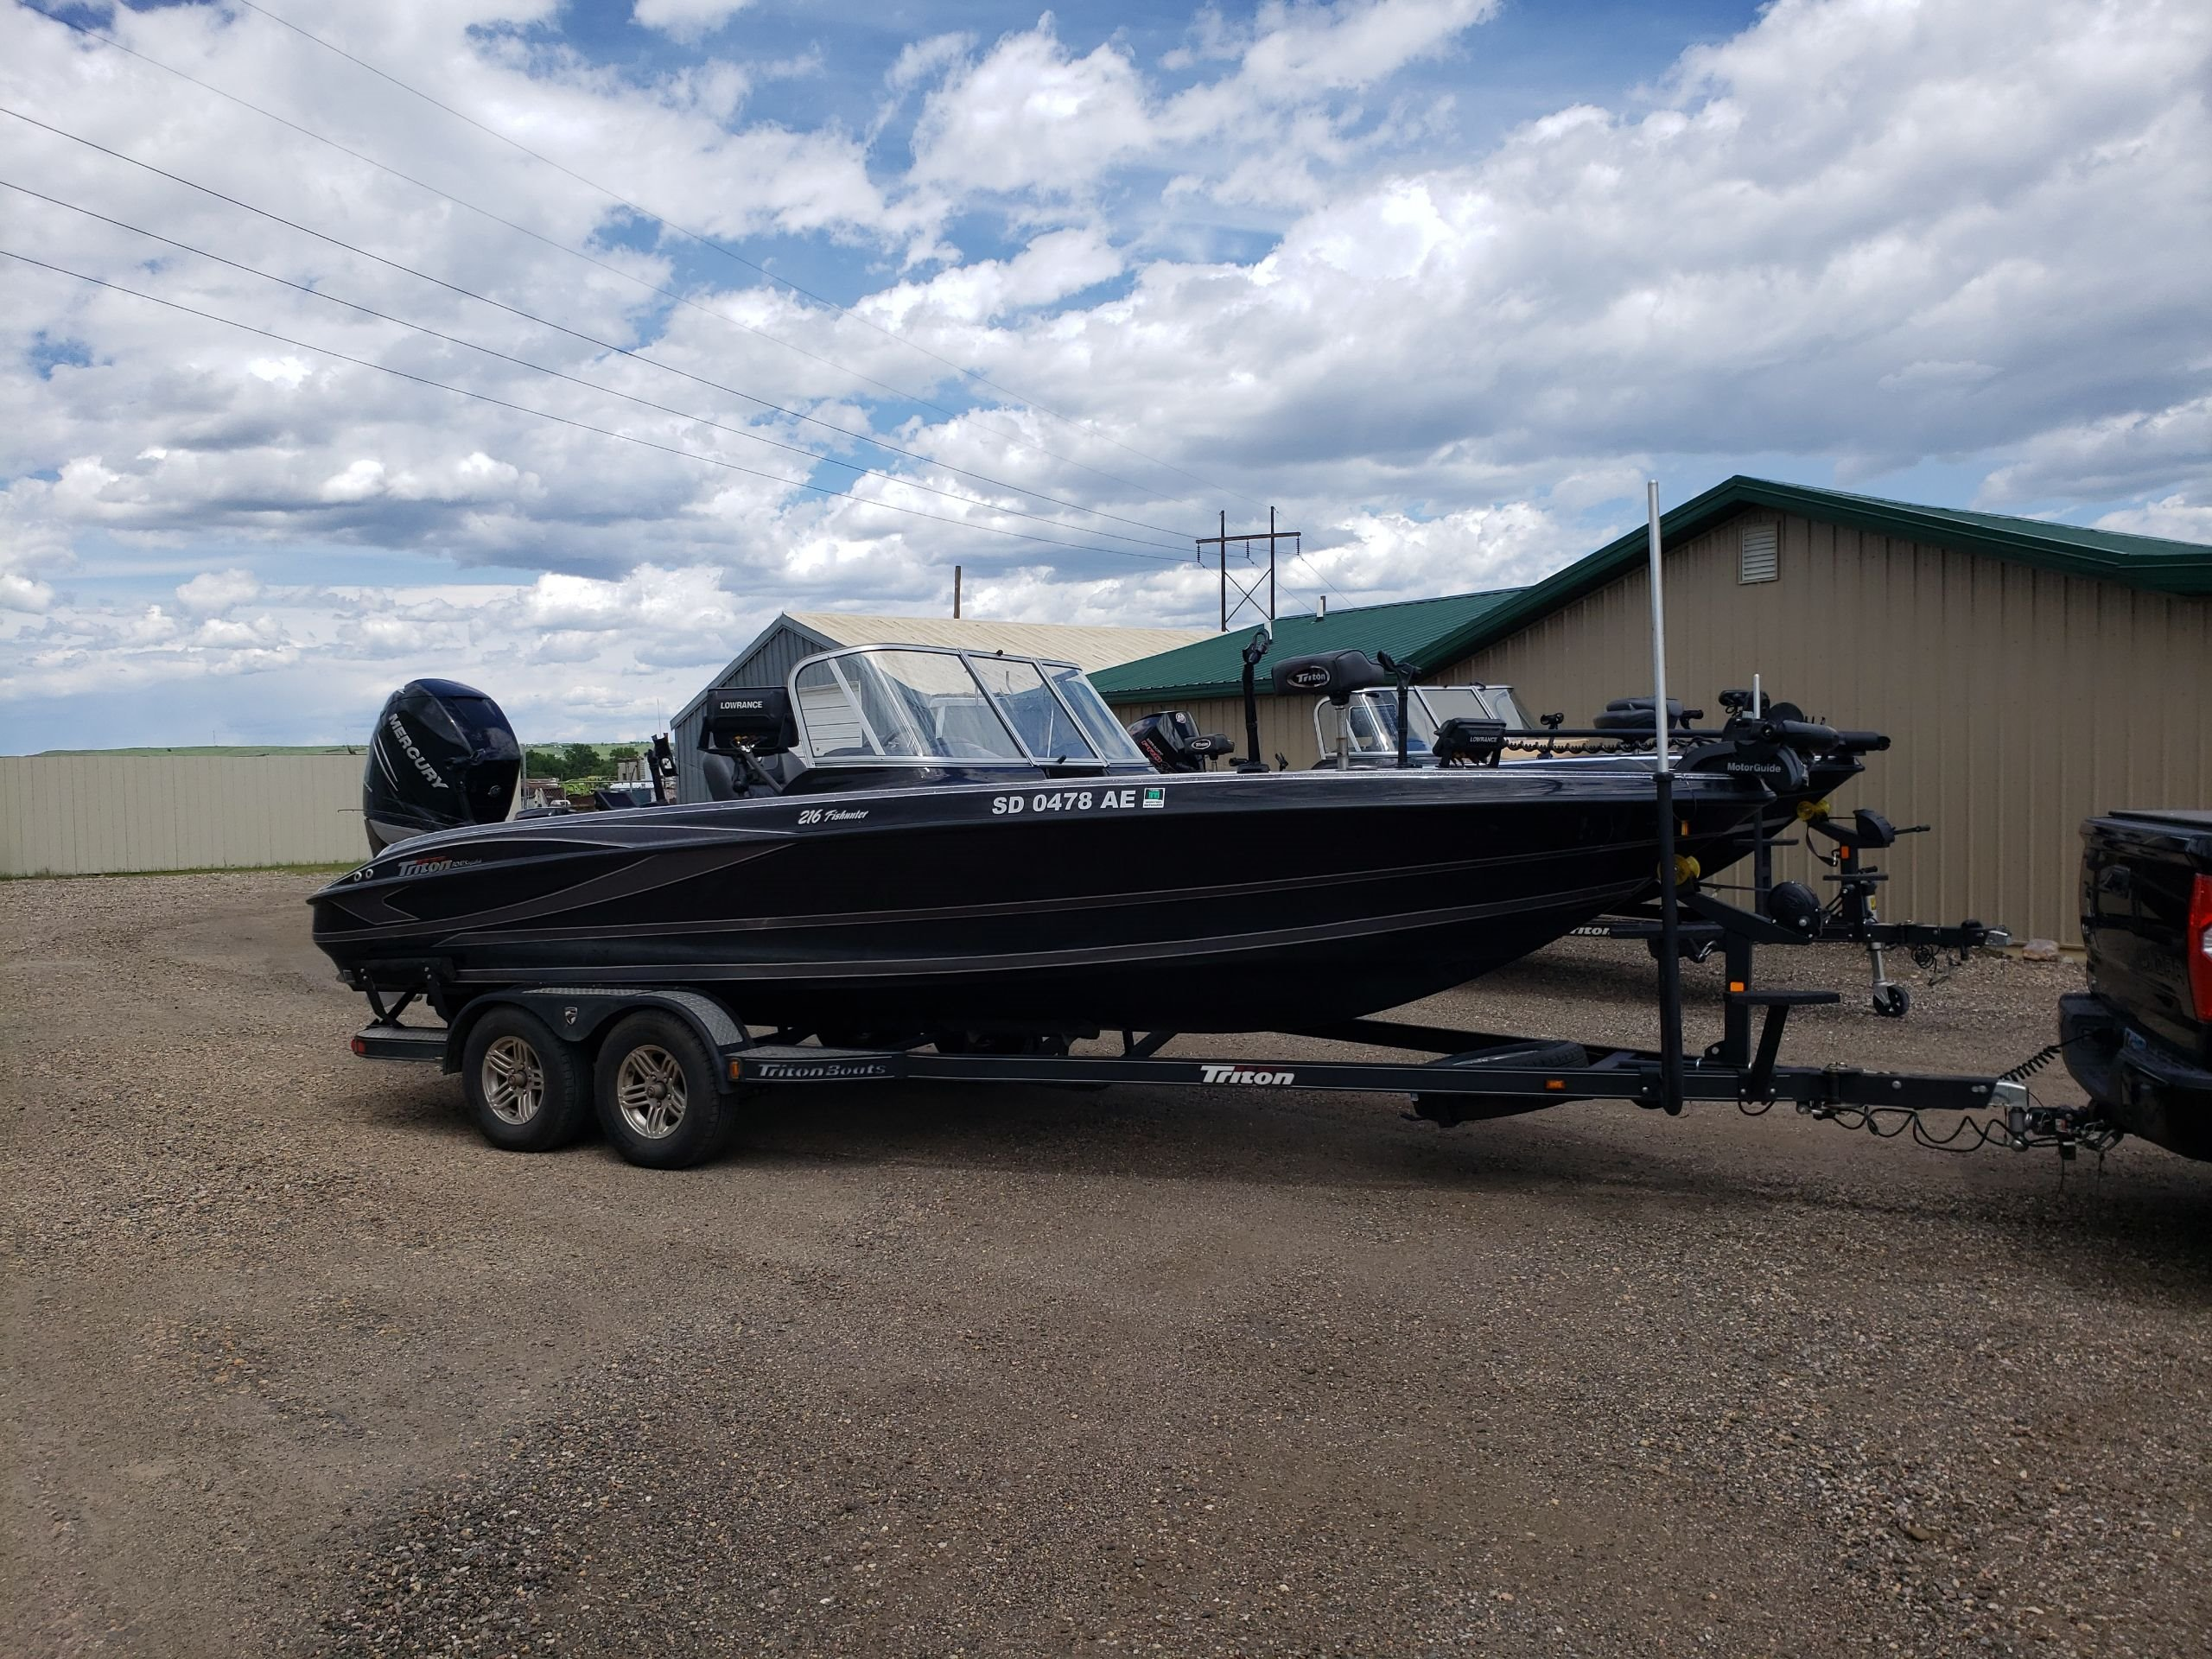 Triton boats for sale in 58402 - Boat Trader